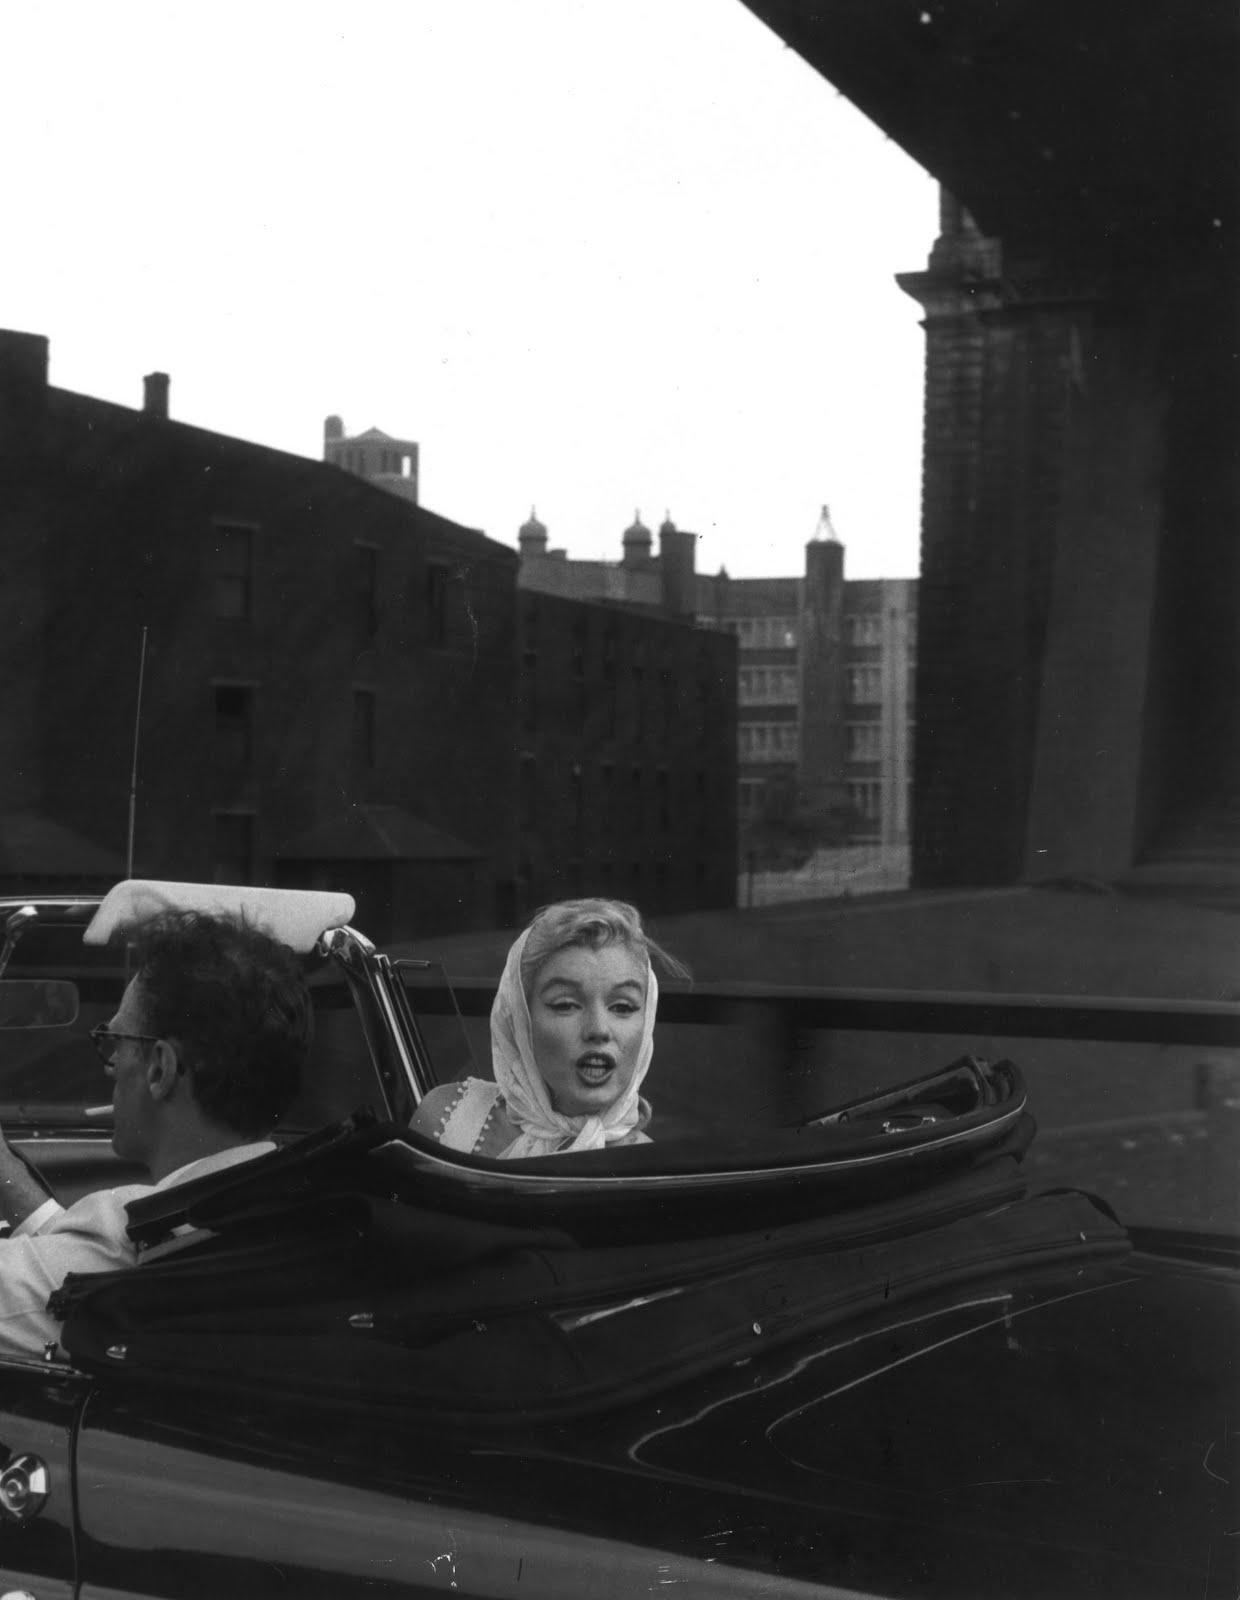 http://1.bp.blogspot.com/-ac67FrPqBWA/TfFrEioq8PI/AAAAAAAAAMk/_htDFszGDlw/s1600/Marilyn+Monroe+and+Arthur+Miller+1956+v.jpg